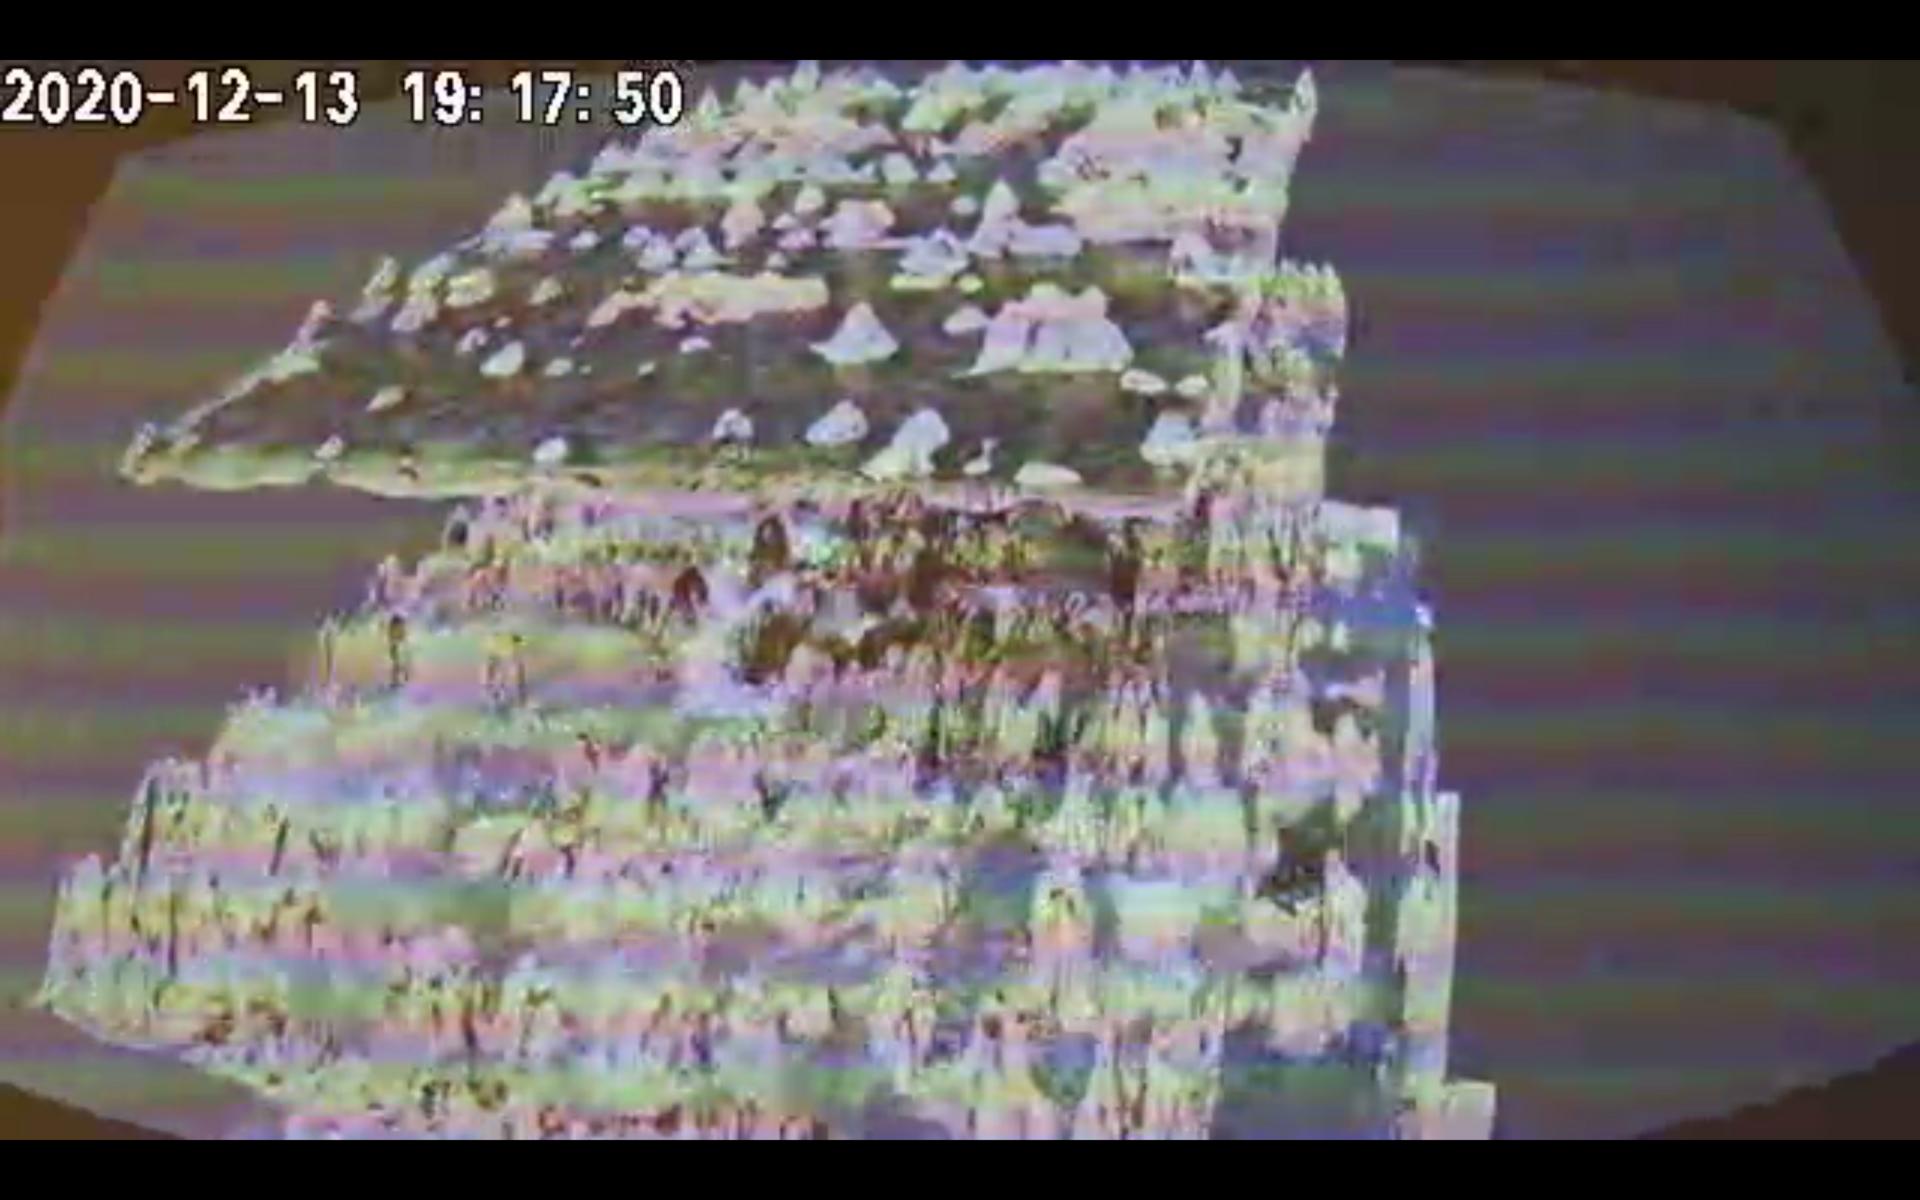 Sound landscape in CCTV camera